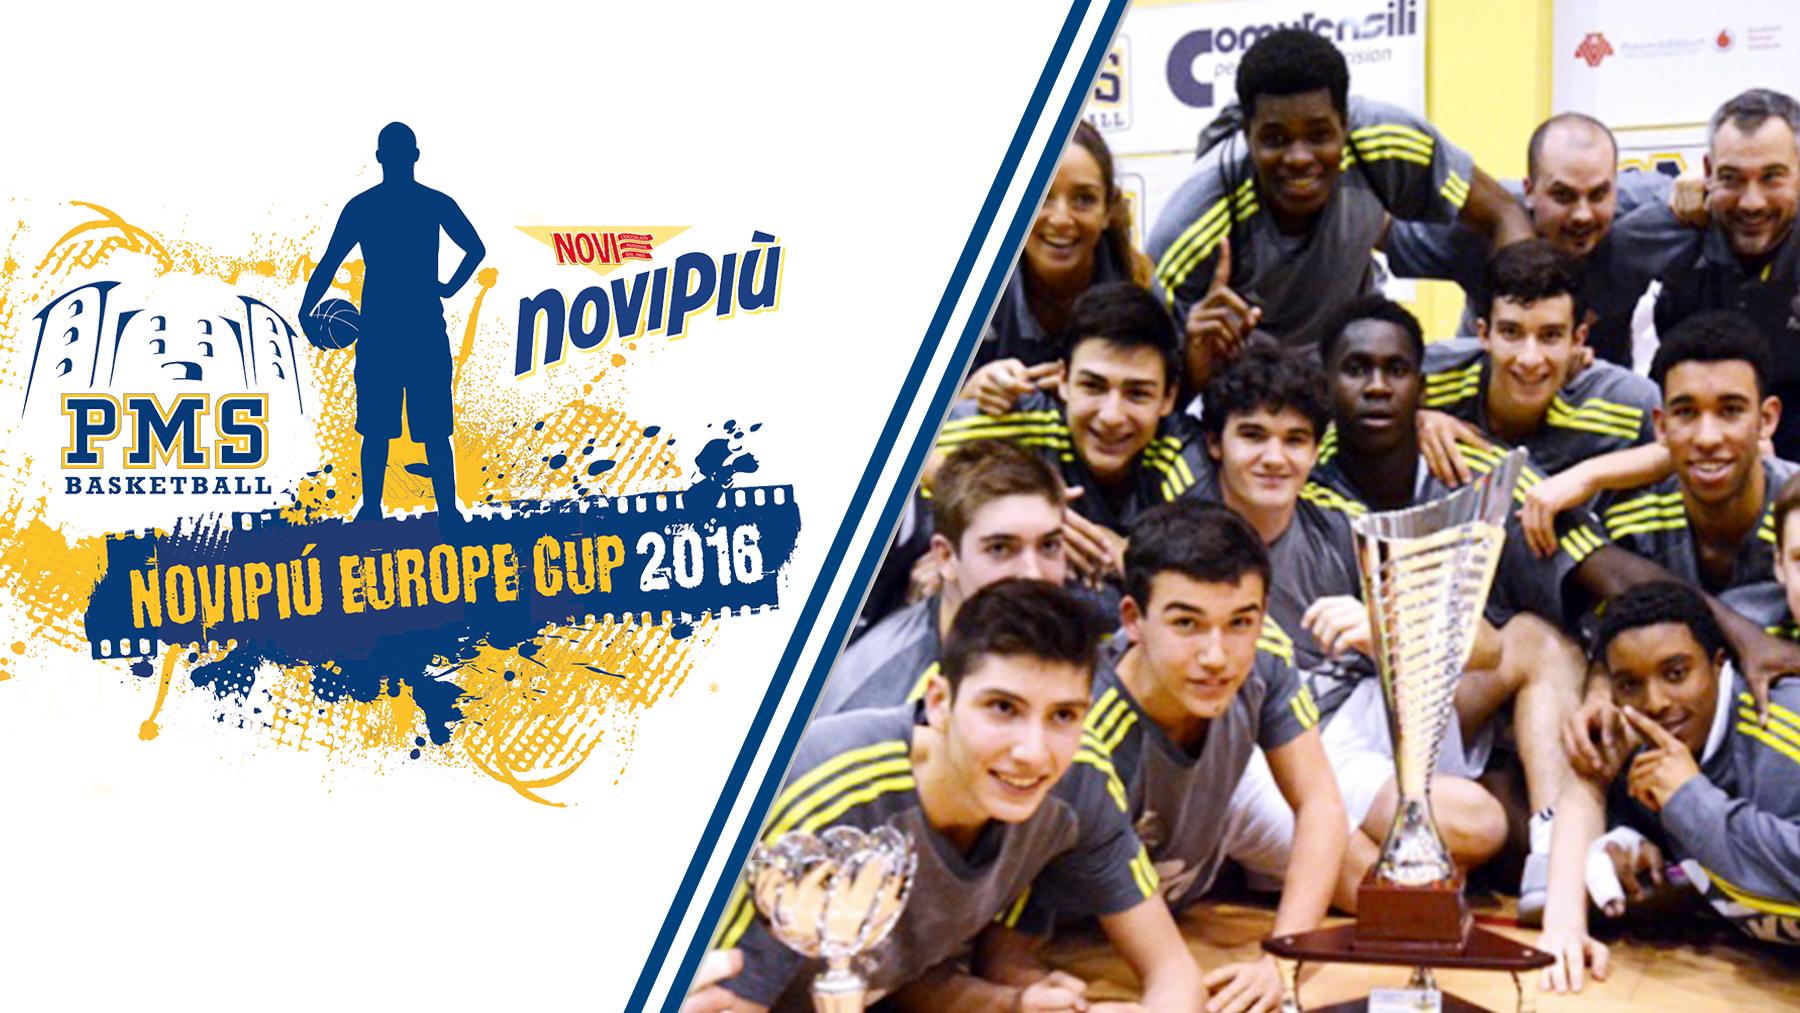 Novipiù Europe Cup 2016